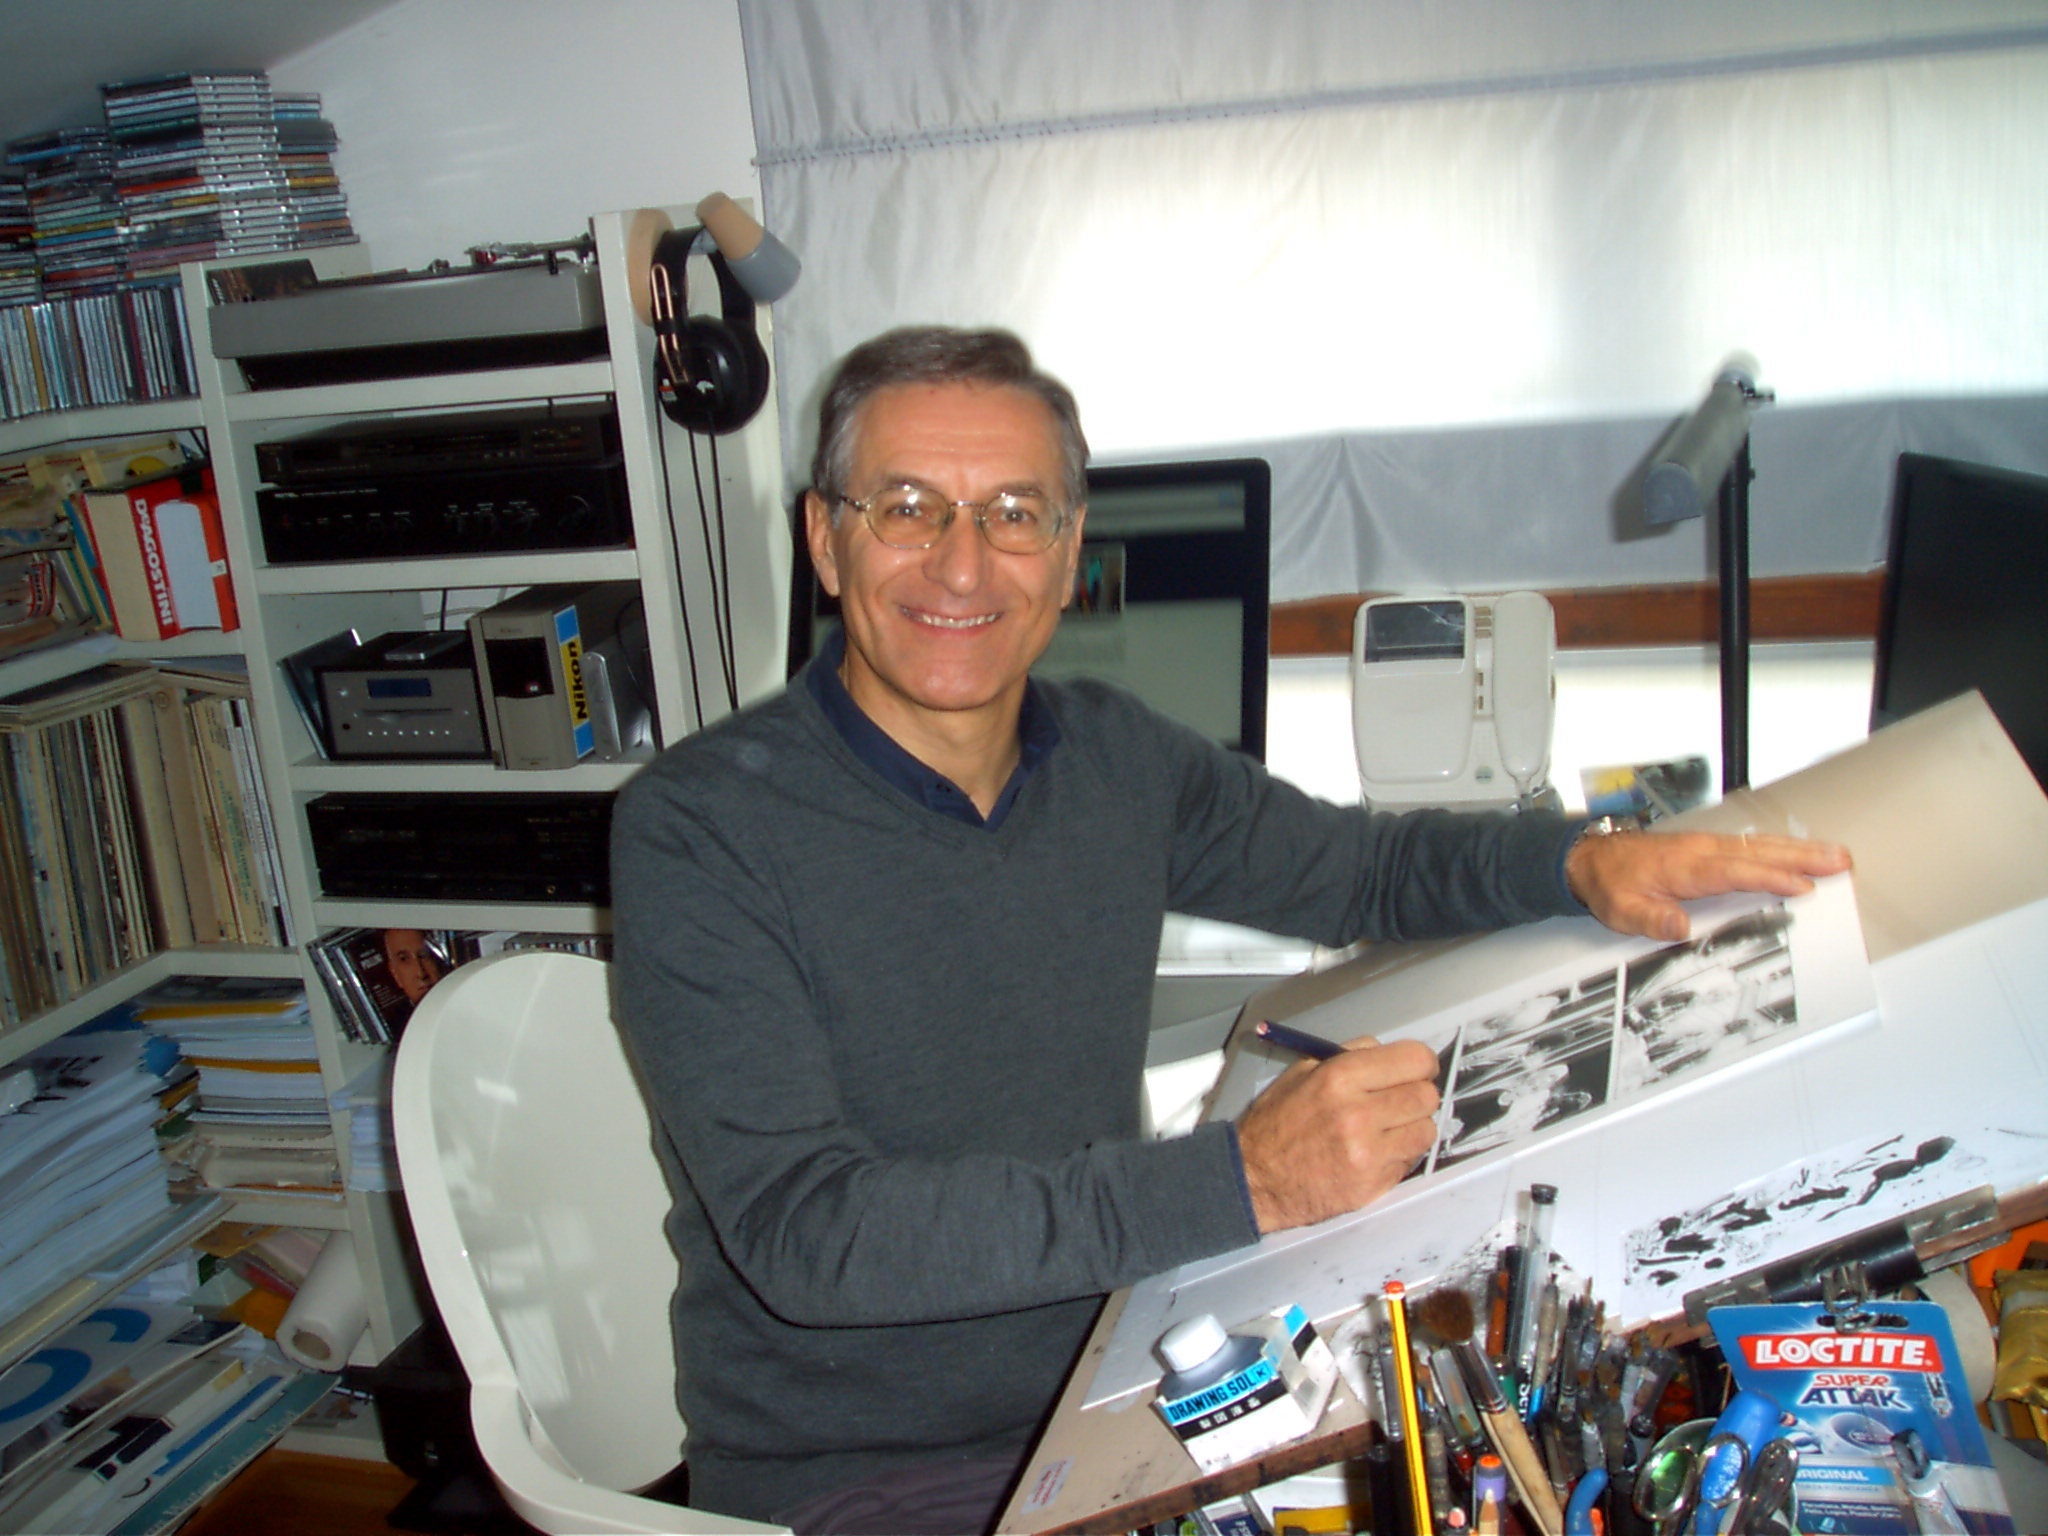 Fabio Civitelli al lavoro nel suo studio (foto: Laura Bondi)